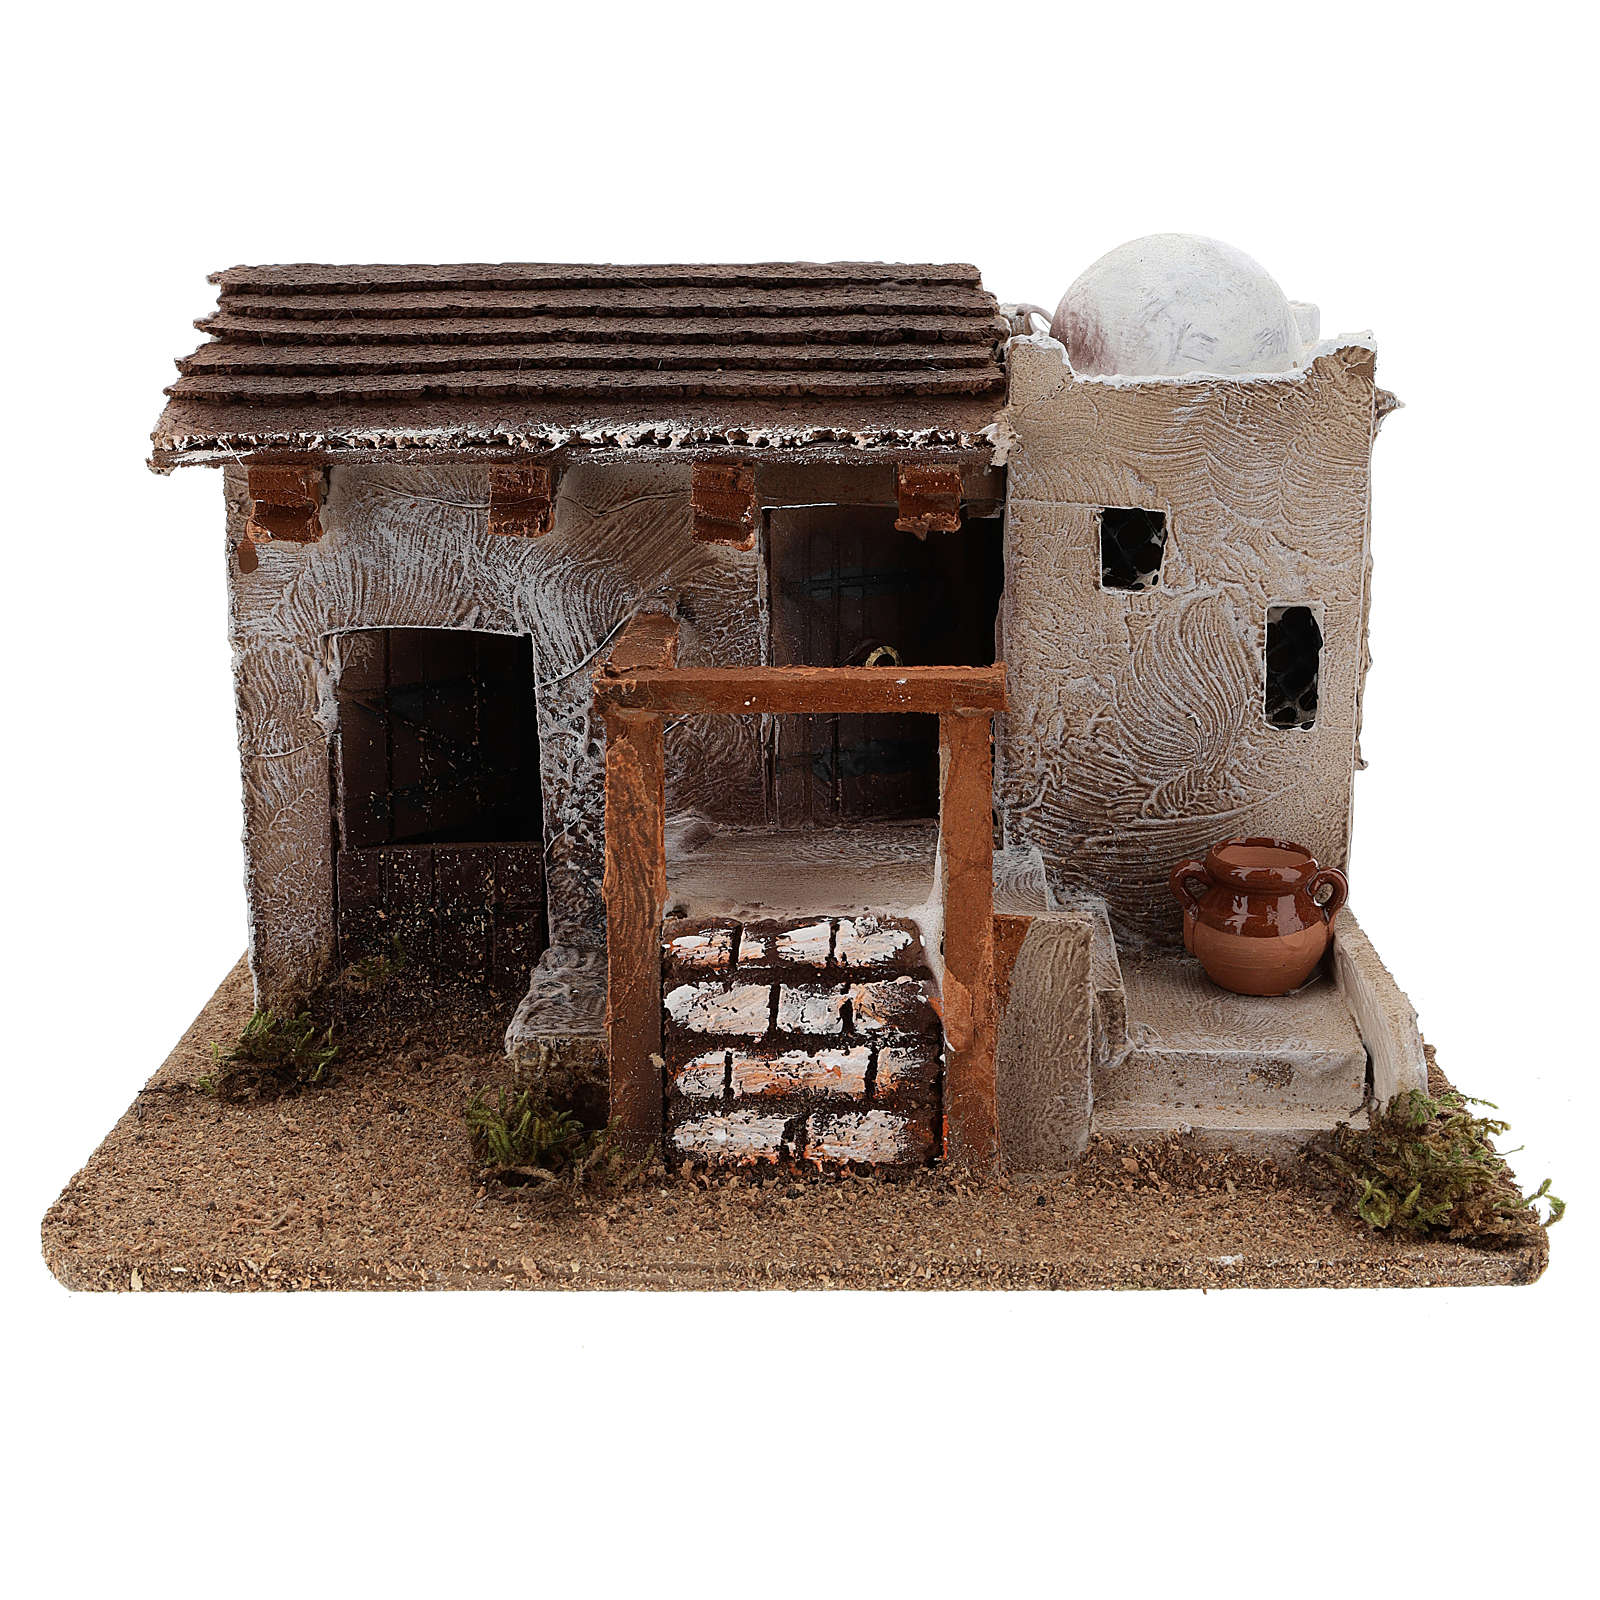 Arabic style house for Nativity scene 15x25x15 cm 4